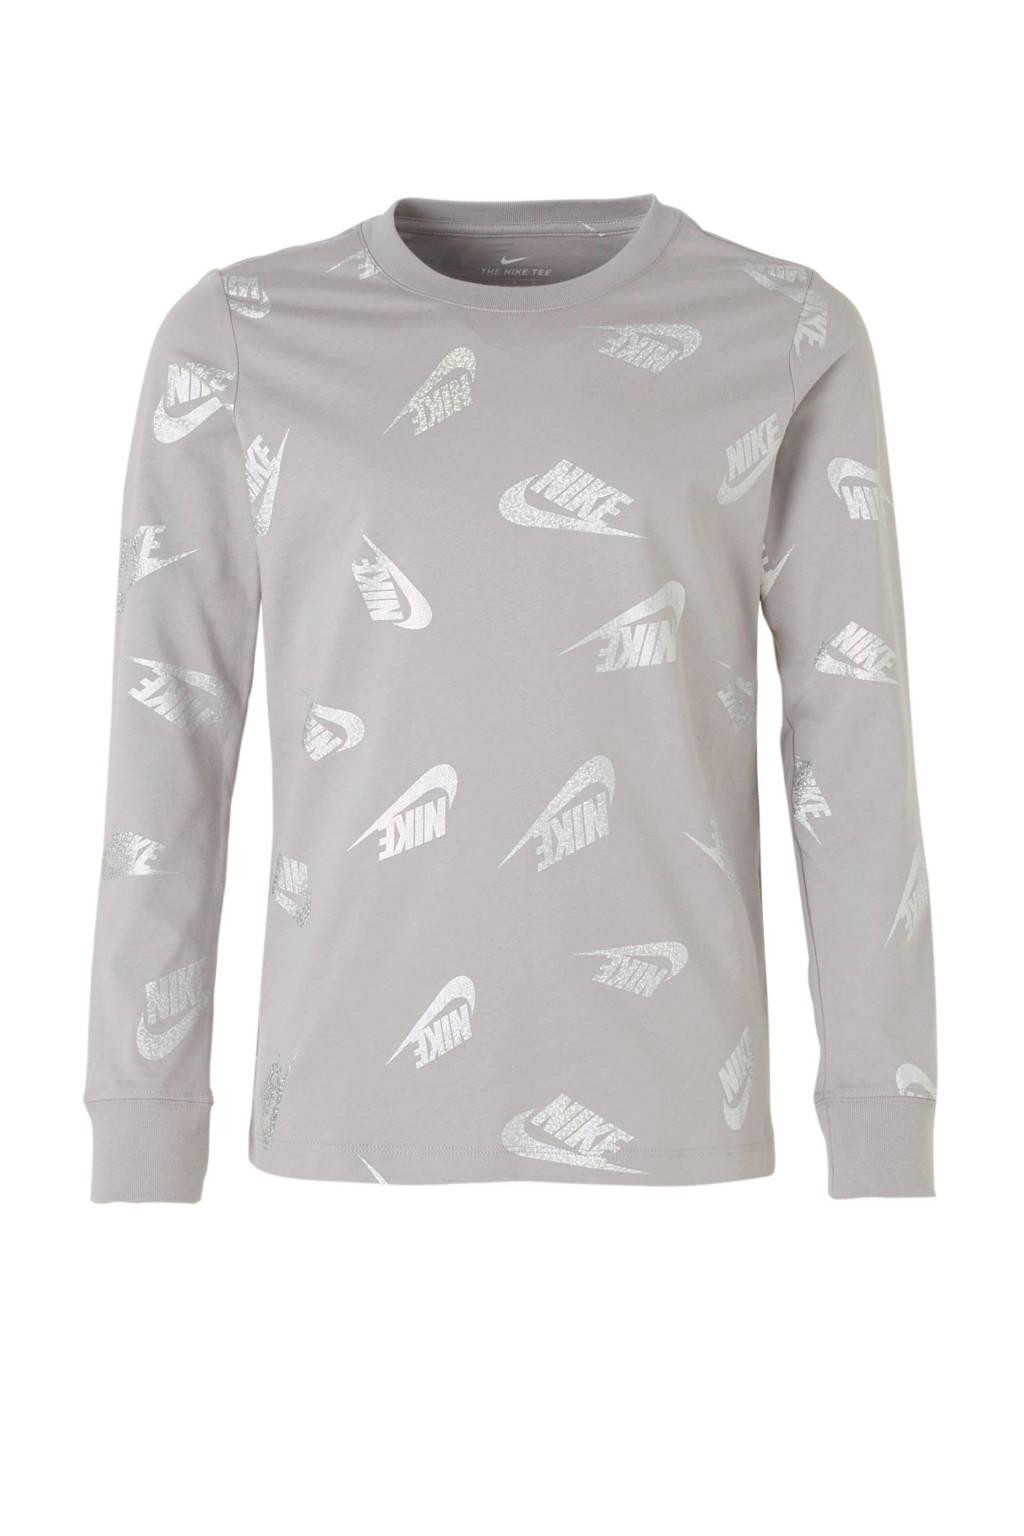 Nike   T-shirt grijs, Grijs/zilver